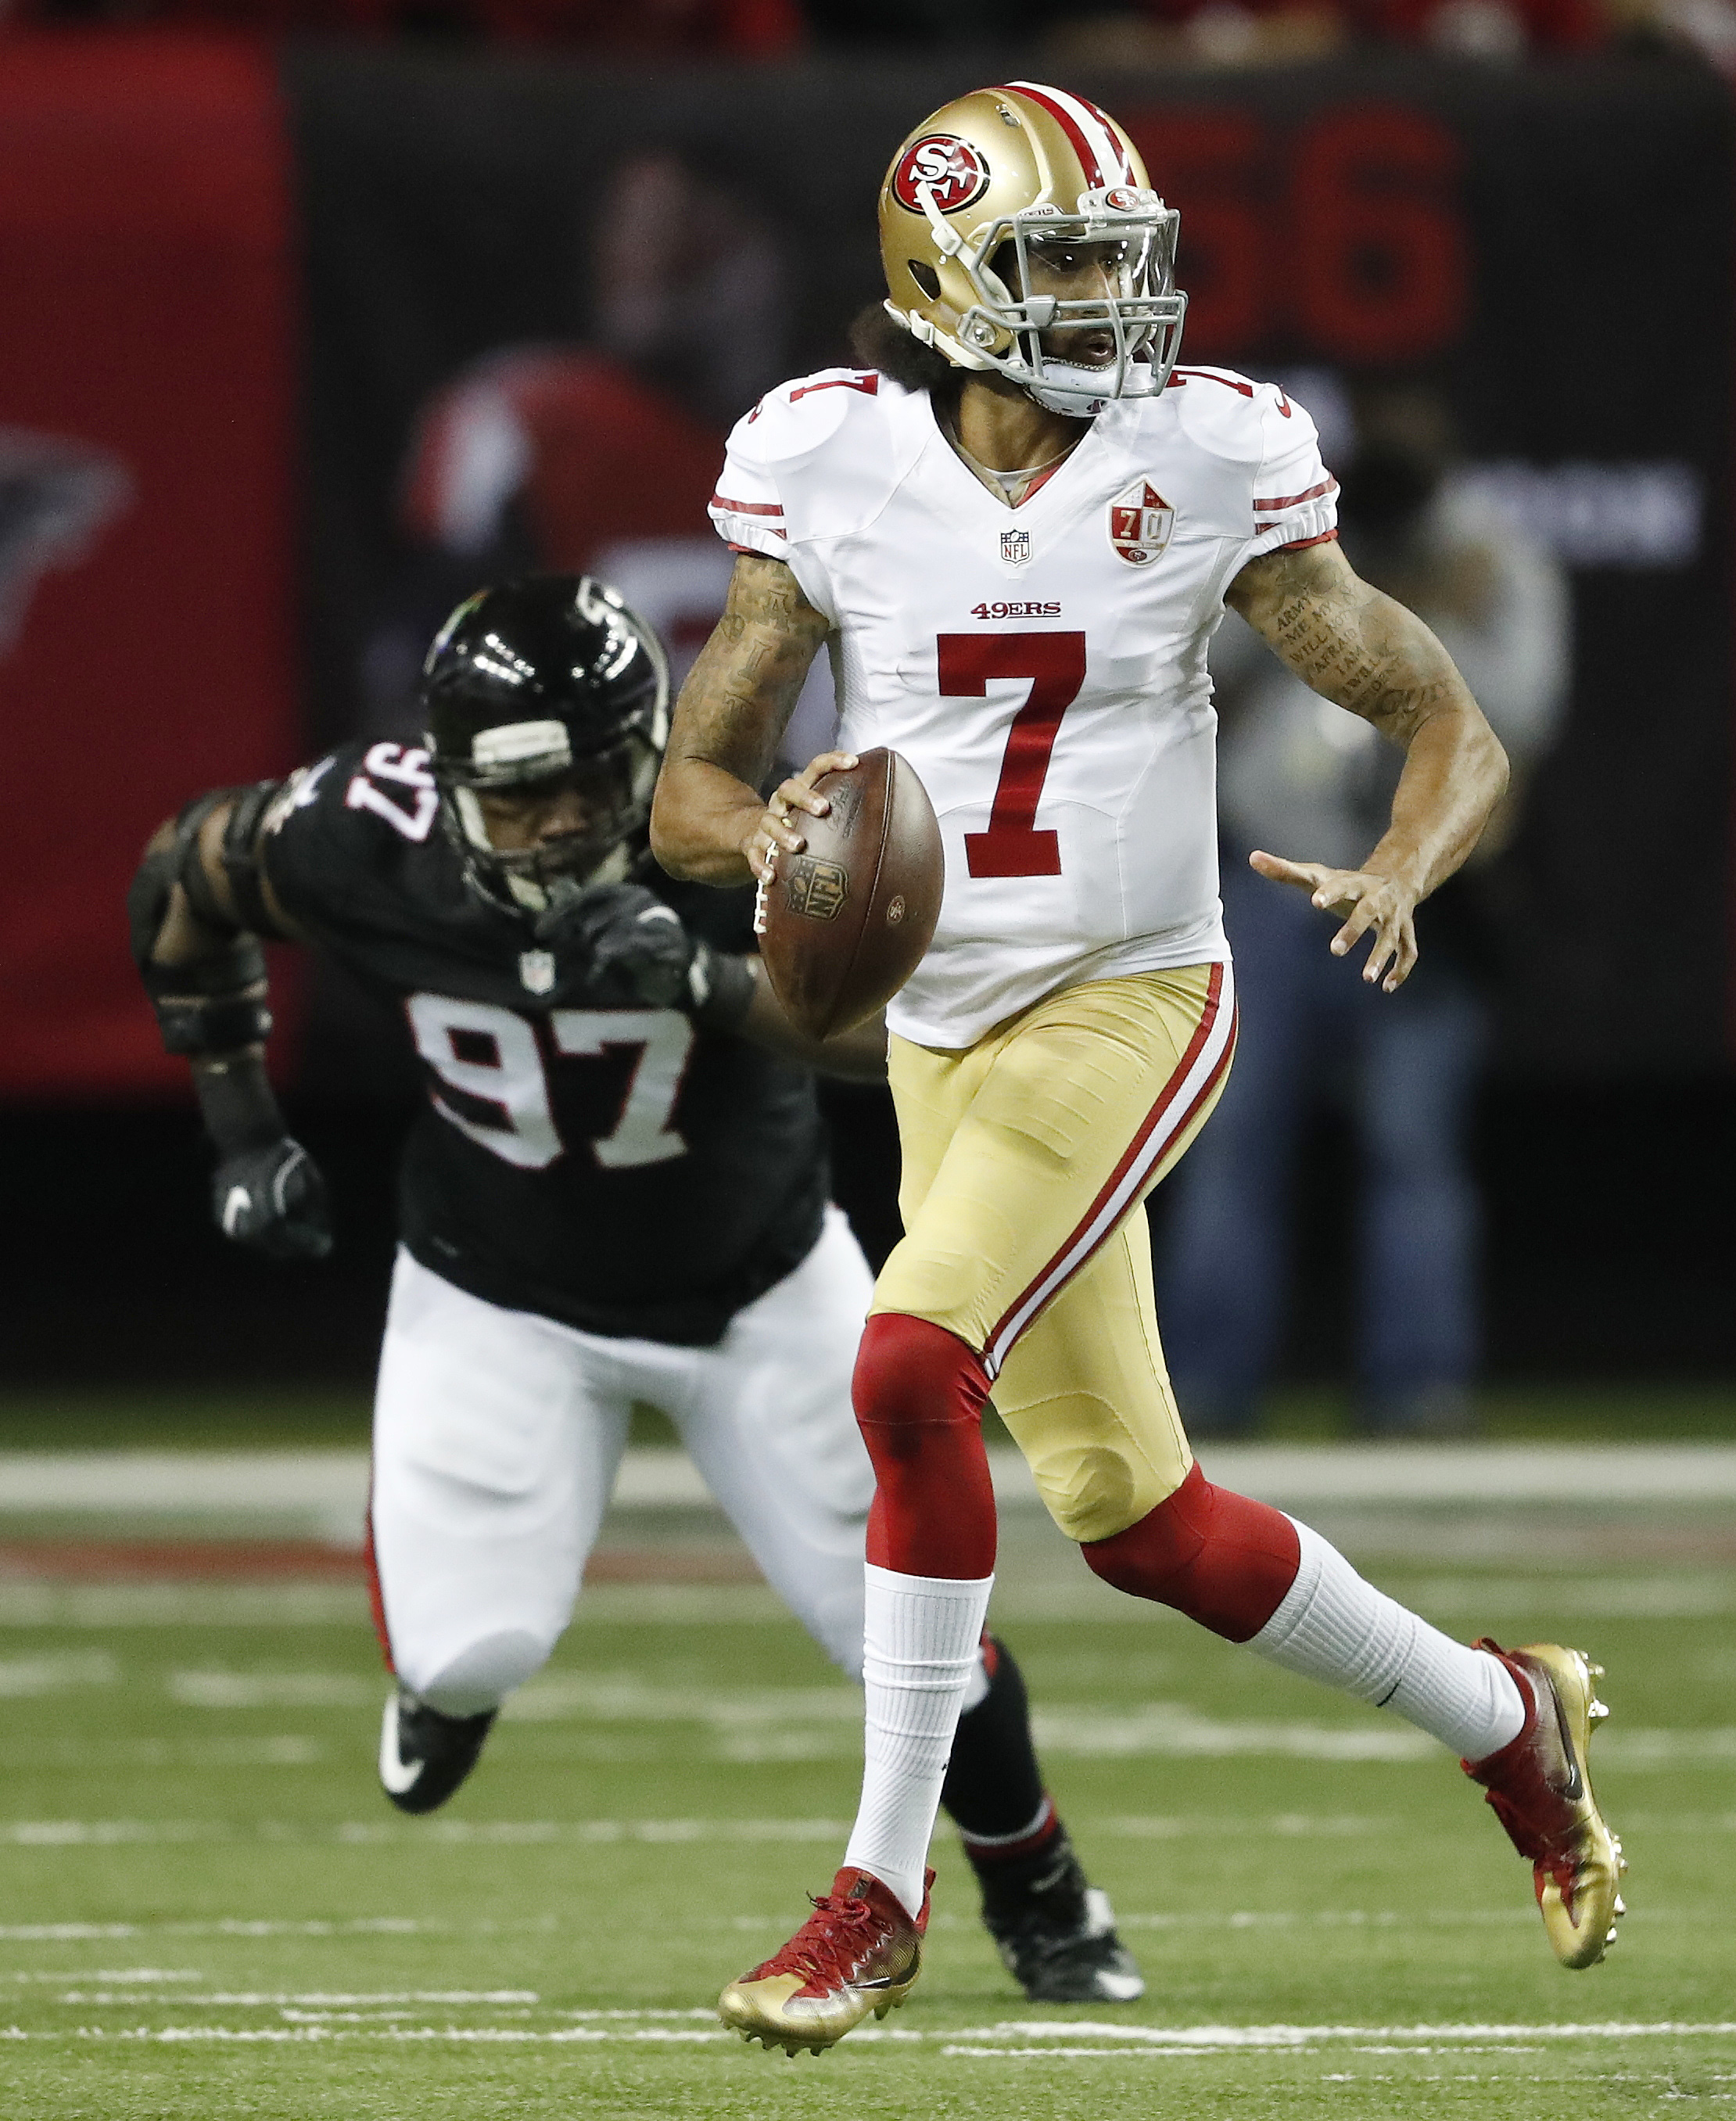 San Francisco 49ers quarterback Colin Kaepernick (7) runs out of the pocket as Atlanta Falcons defensive tackle Grady Jarrett (97) looks on during the first half of an NFL football game, Sunday, Dec. 18, 2016, in Atlanta. (AP Photo/John Bazemore)